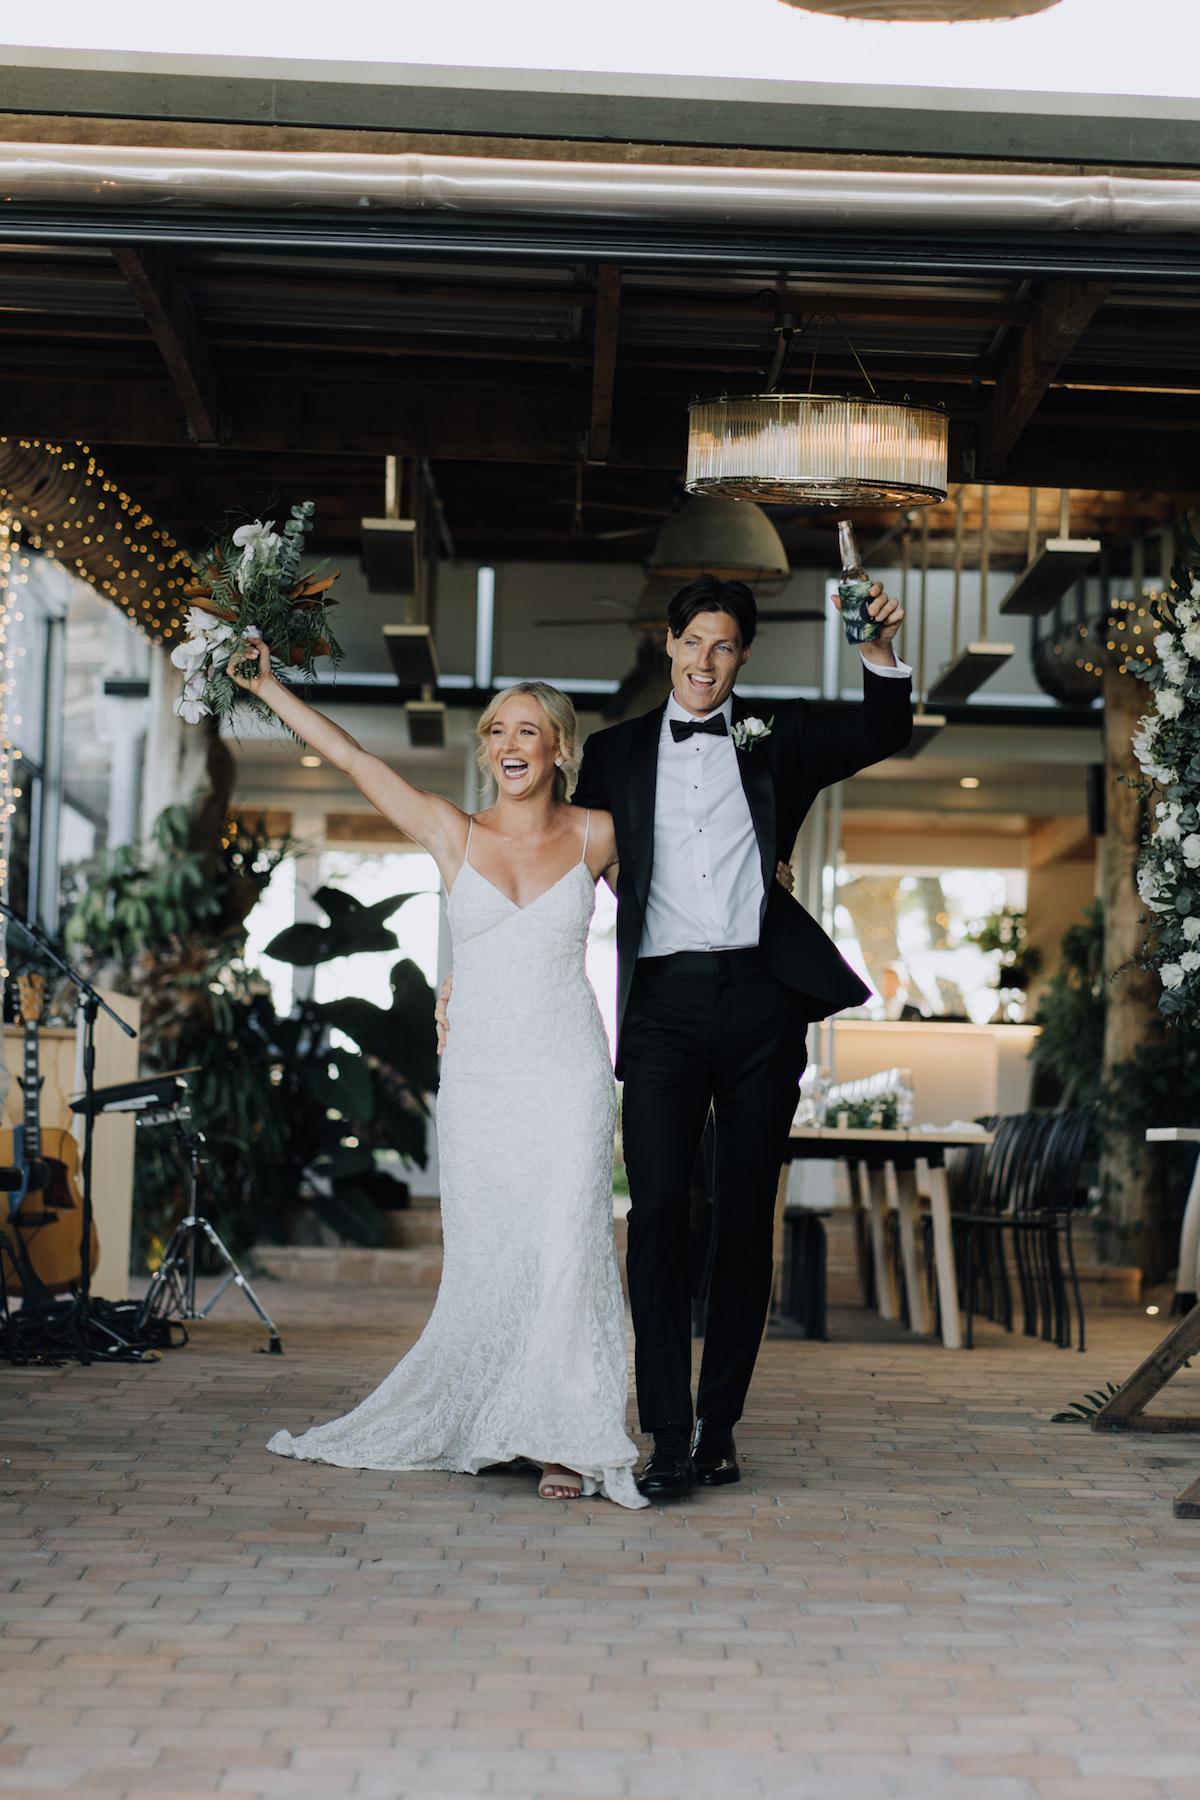 Real Wedding :: Amelia + Joel, Hinterland Wedding at Fins Plantation House, Tweed Coast Wedding Venue